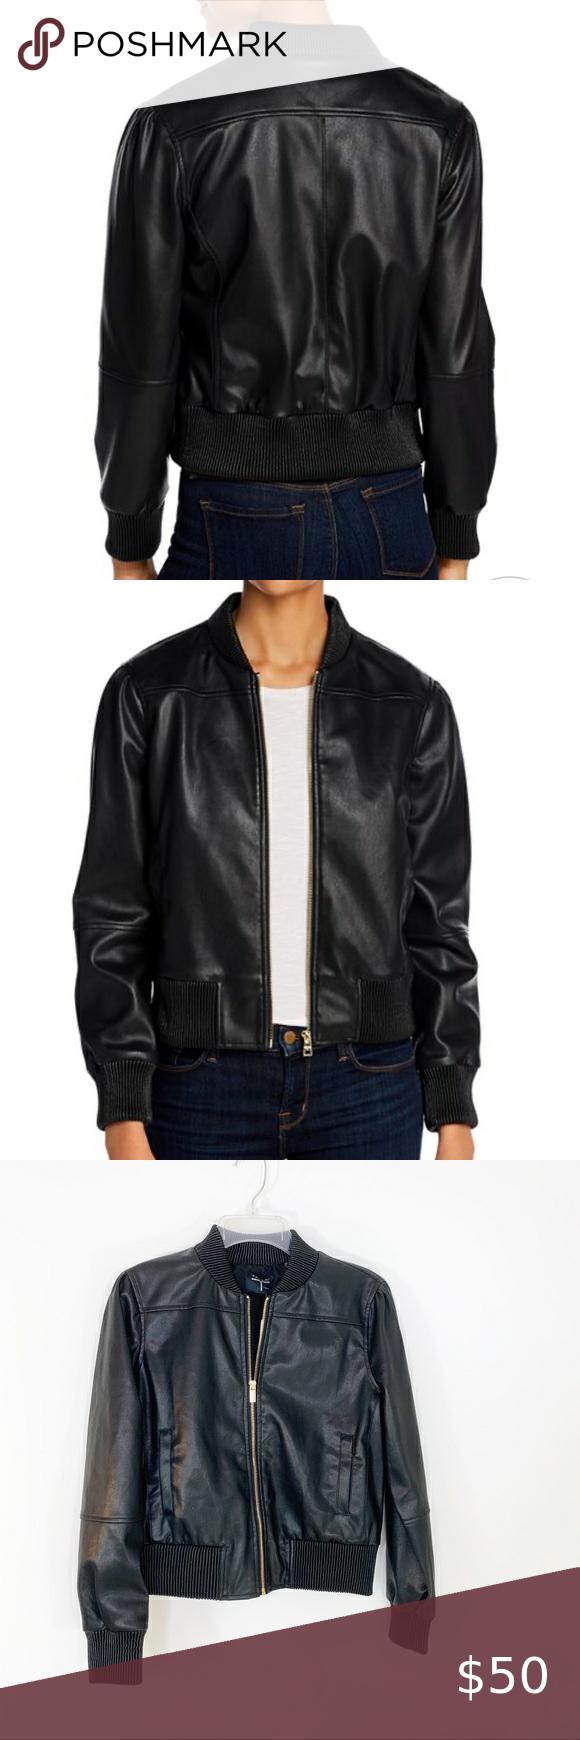 Tahari Vegan Faux Leather Black Bomber Jacket Nwt In 2020 Black Bomber Jacket Faux Leather Bomber Jacket Patterned Bomber Jacket [ 1740 x 580 Pixel ]